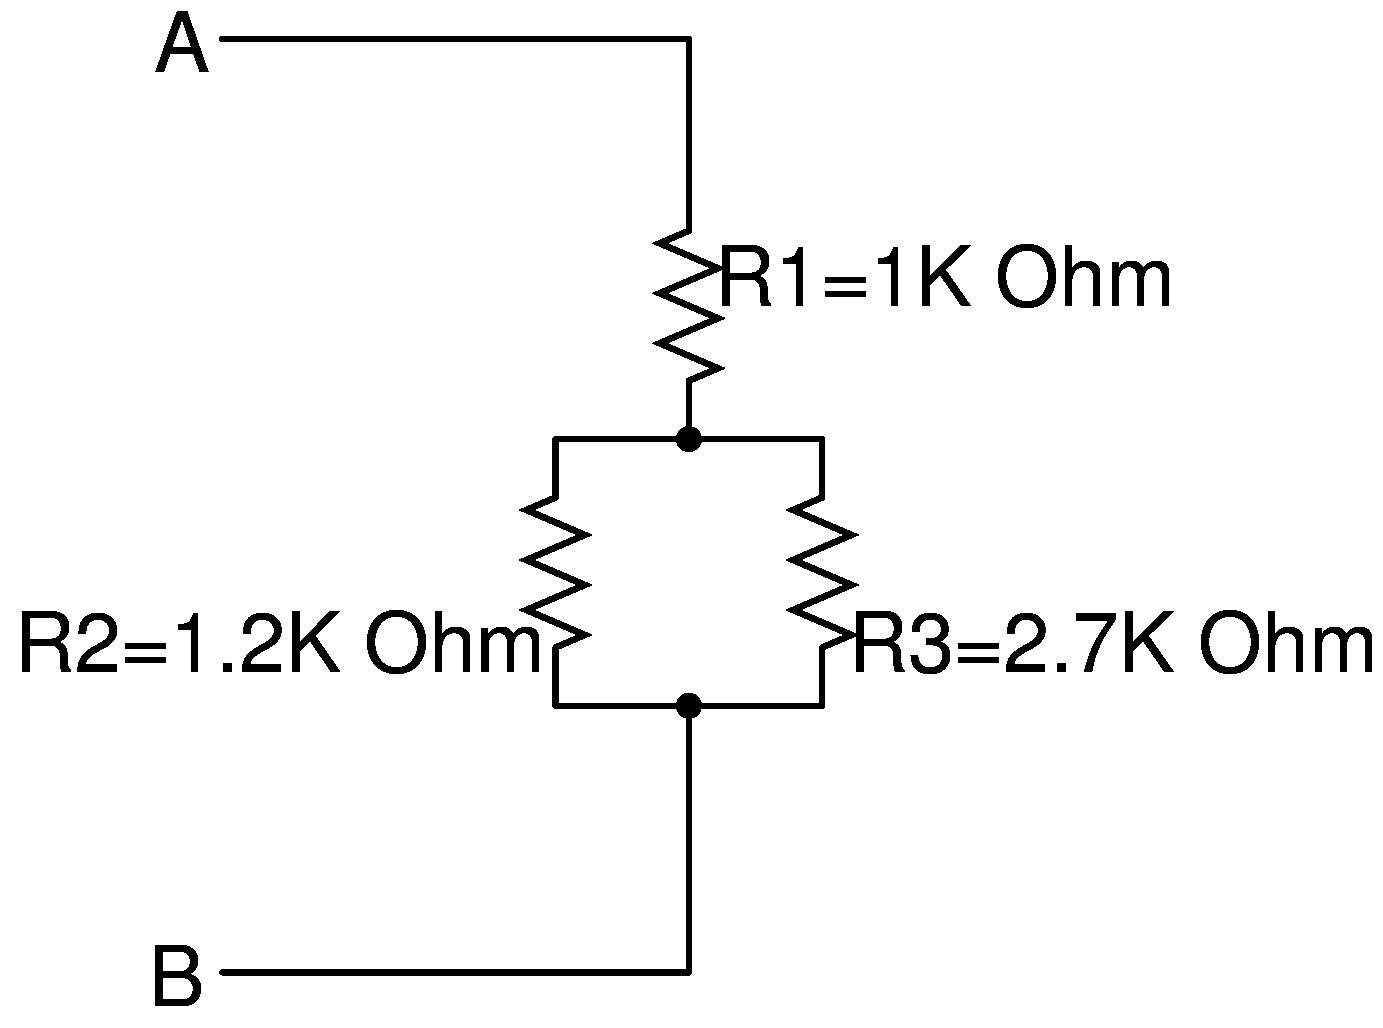 Farmall 6 To 12 Volt Conversion Diagram